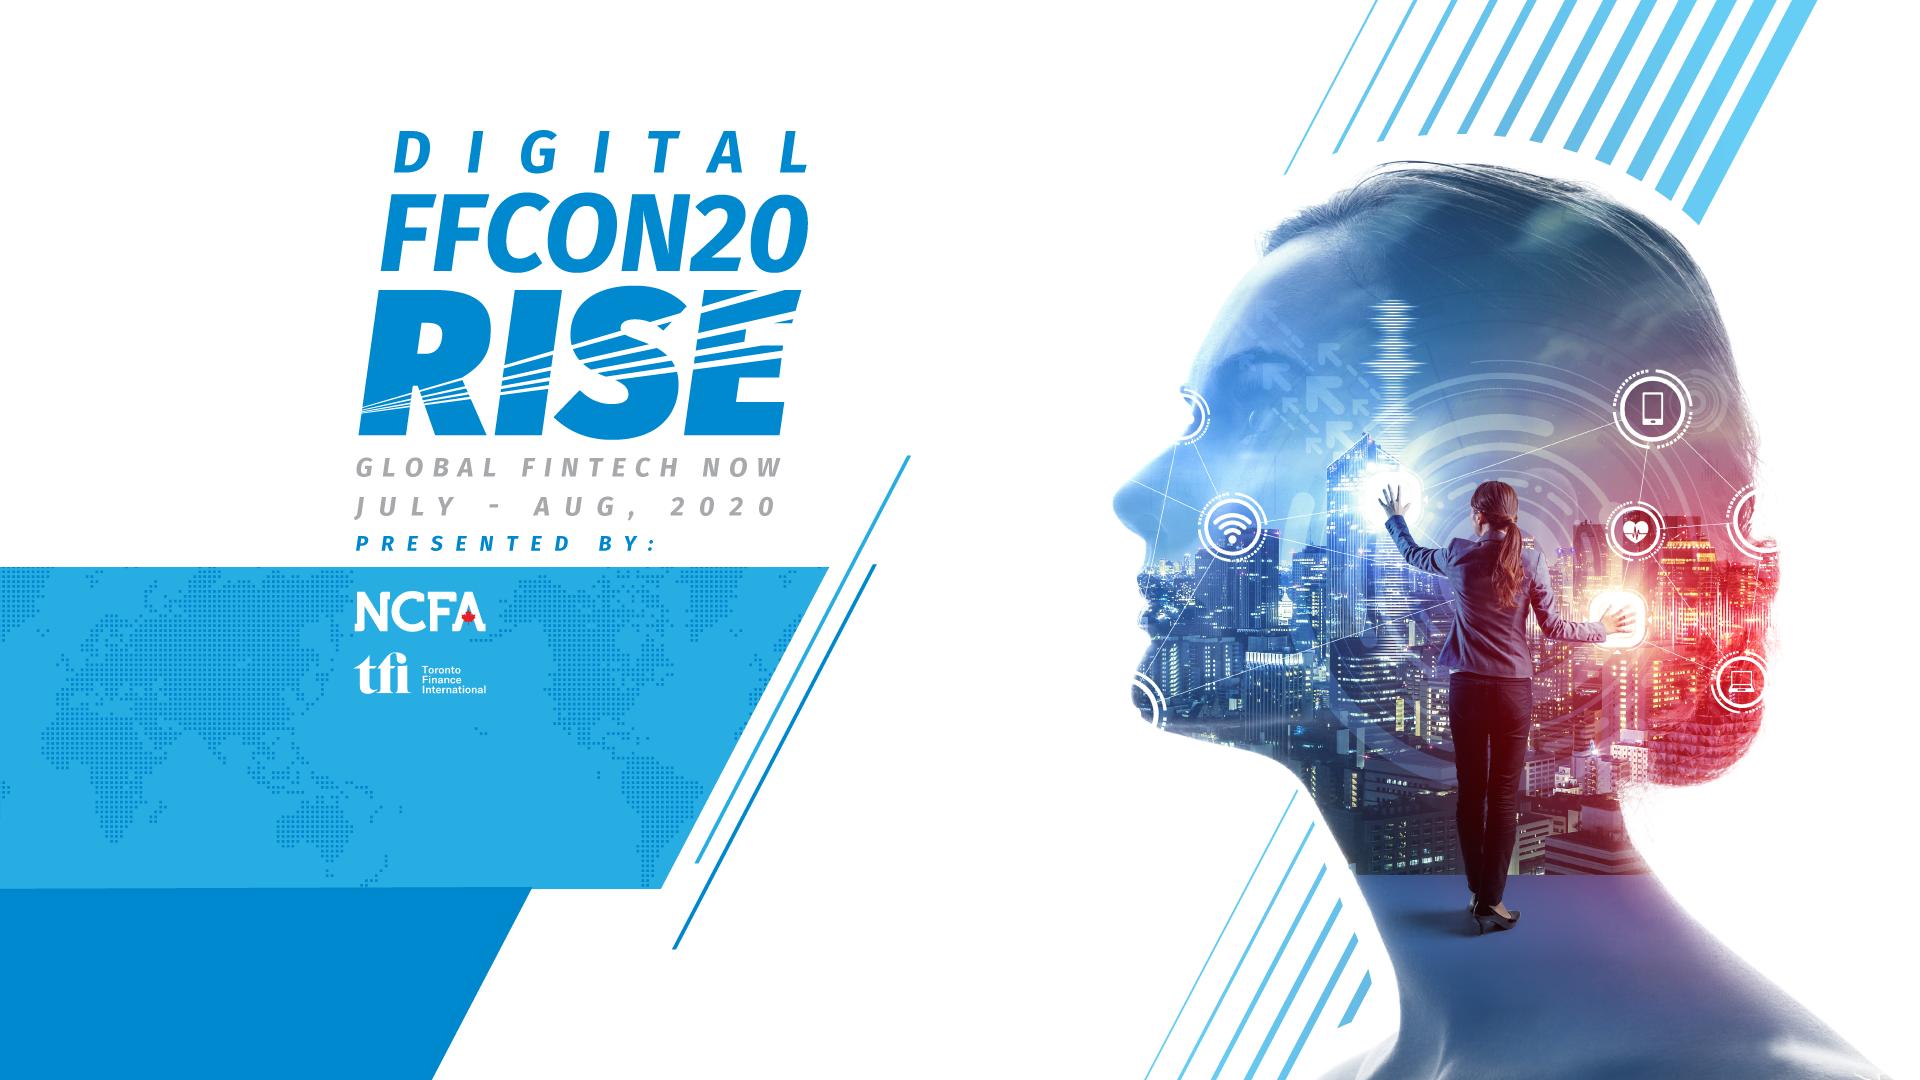 FFCON2020: RISE